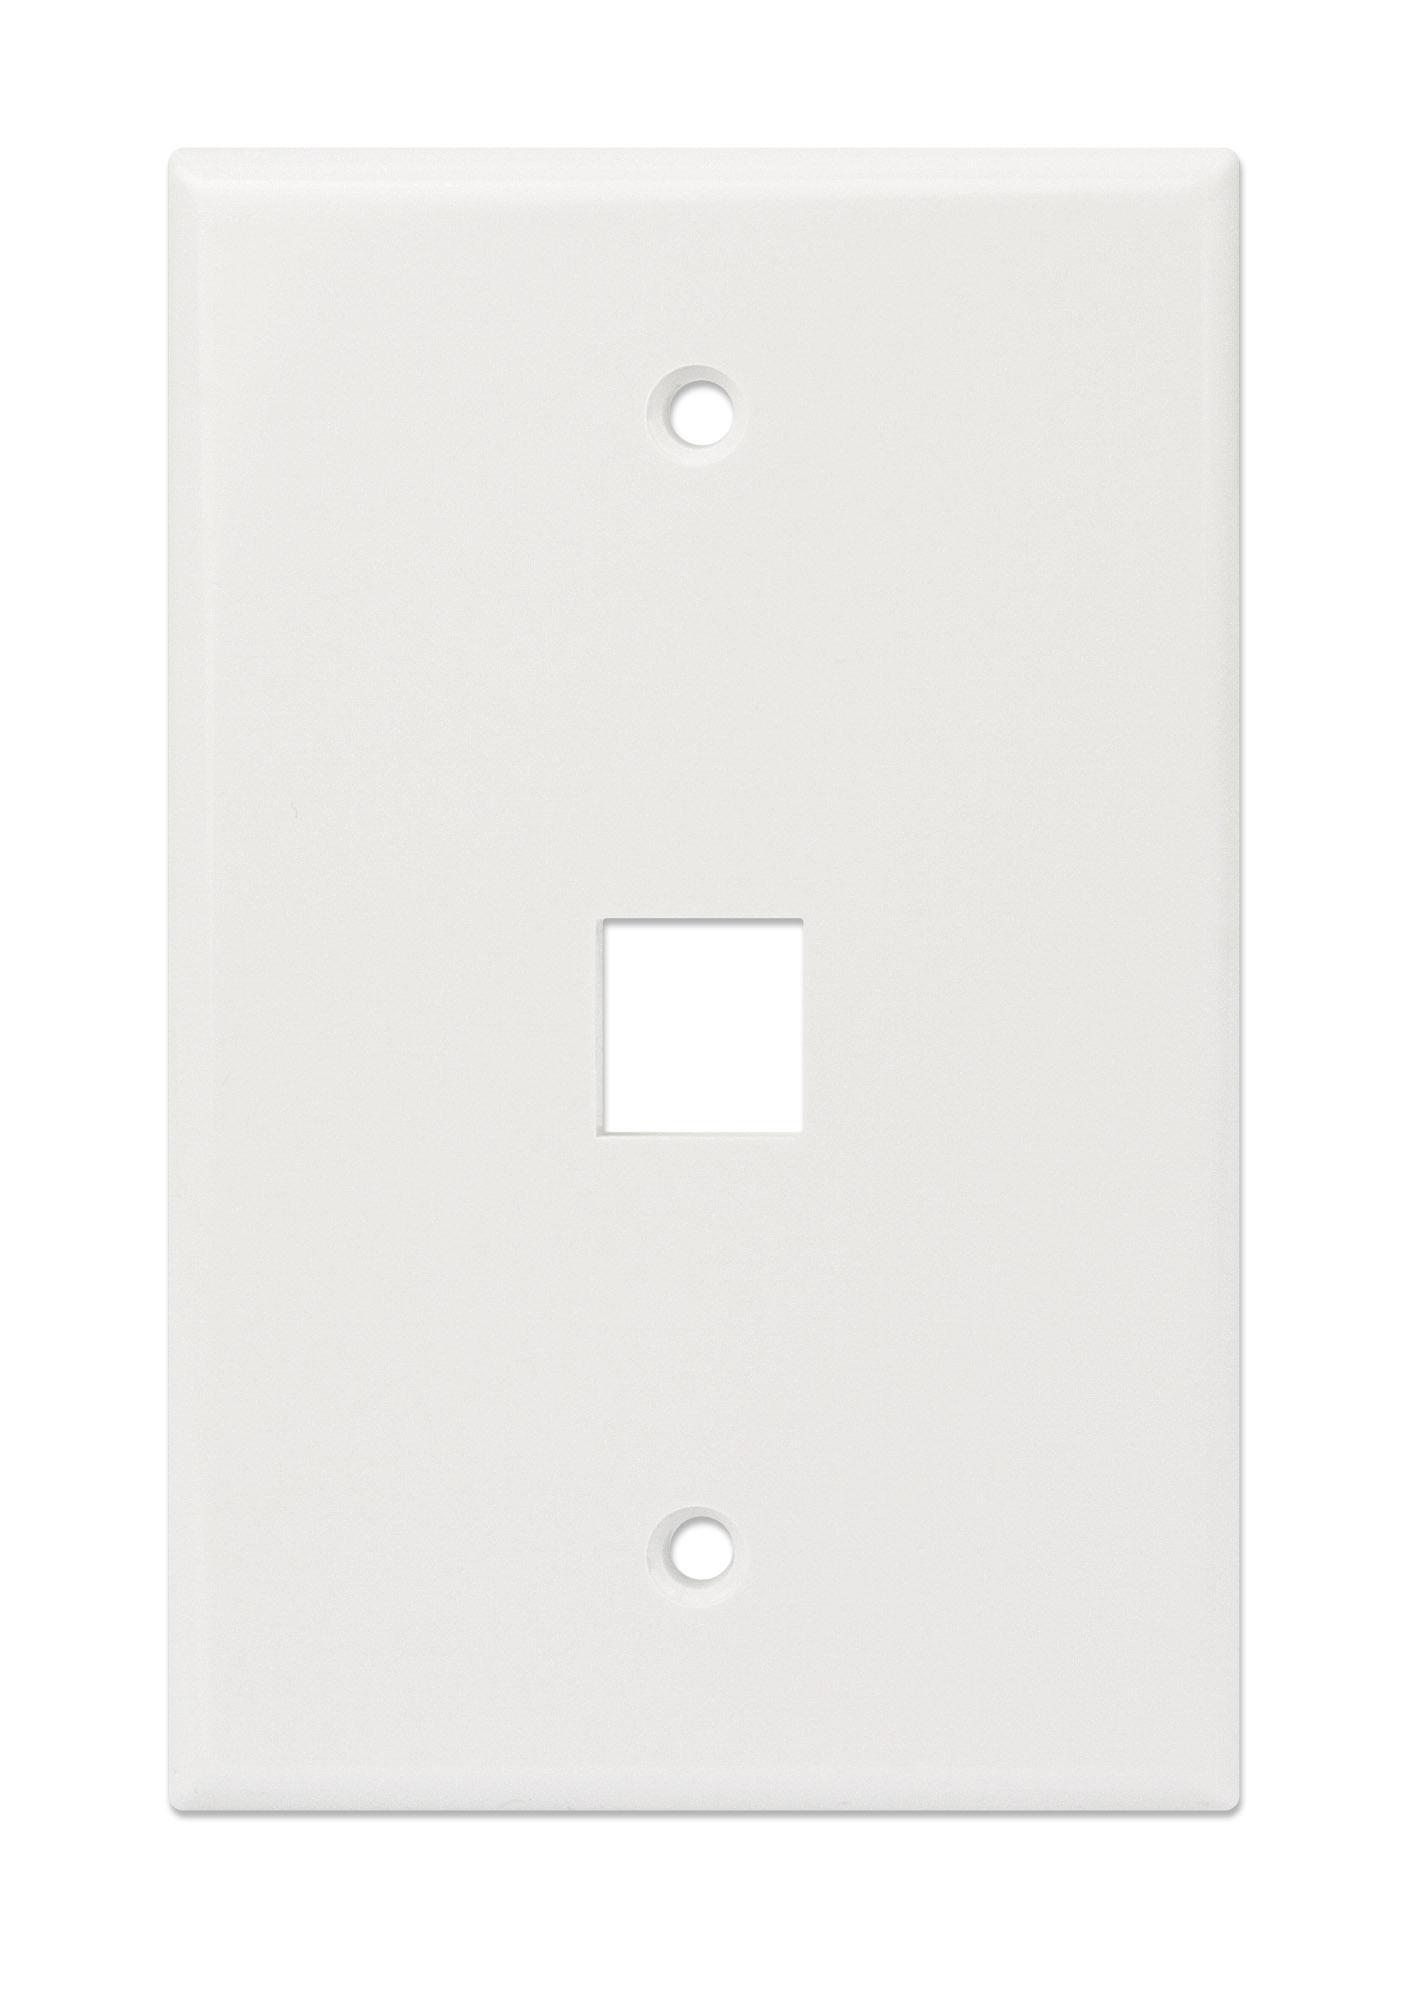 1-Outlet Oversized Keystone Wall Plate